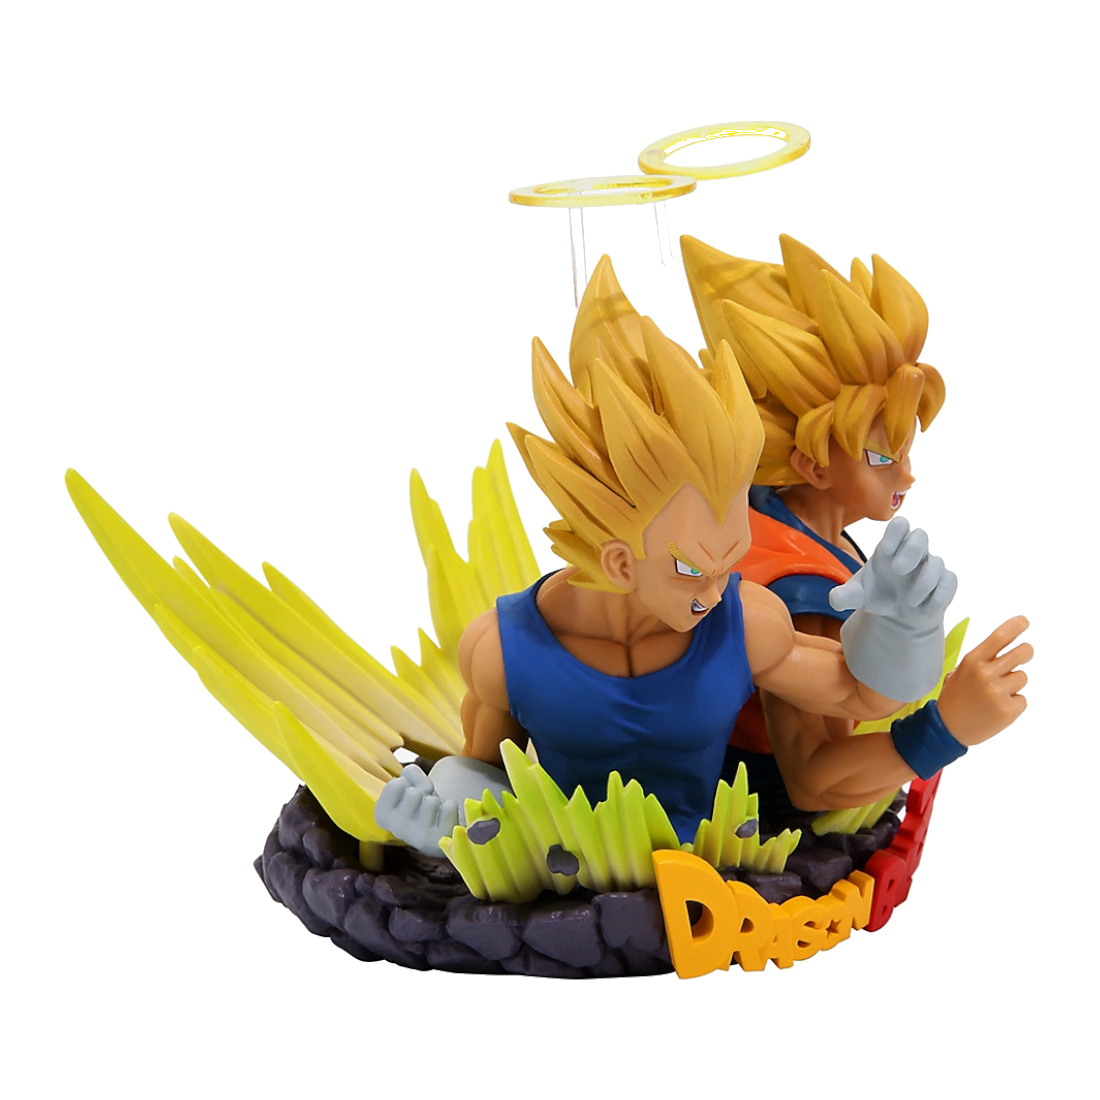 Banpresto Dragon Ball Z Com: Figuration Vol. 2 Super Saiyan Vegeta & Goku